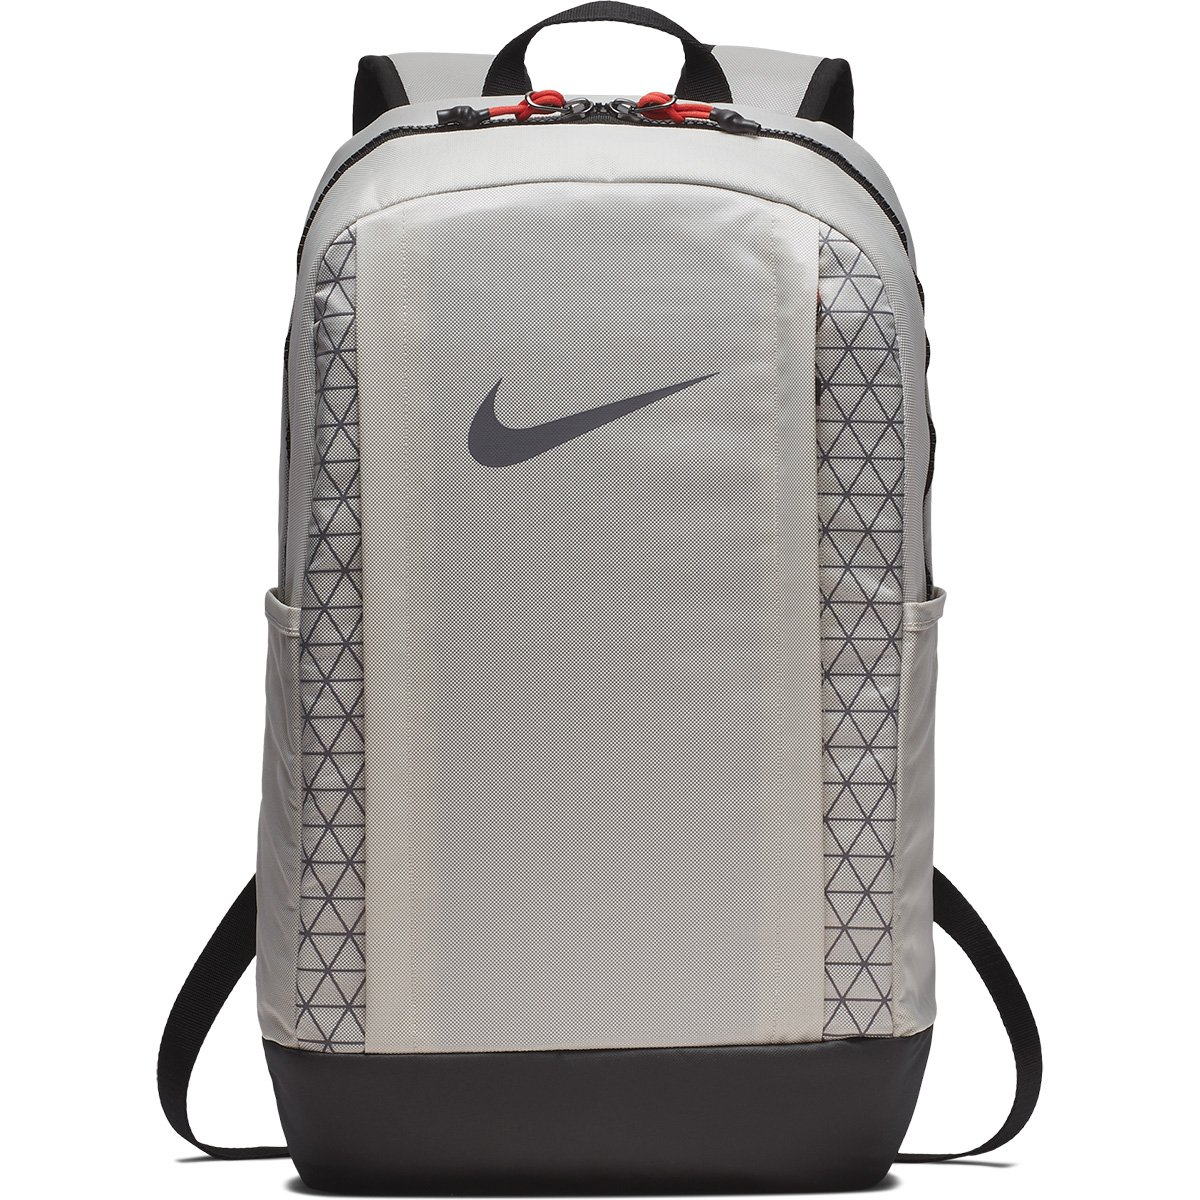 Mochila Nike 24 Jet Vapor Chumbo Litros xtrCshQd